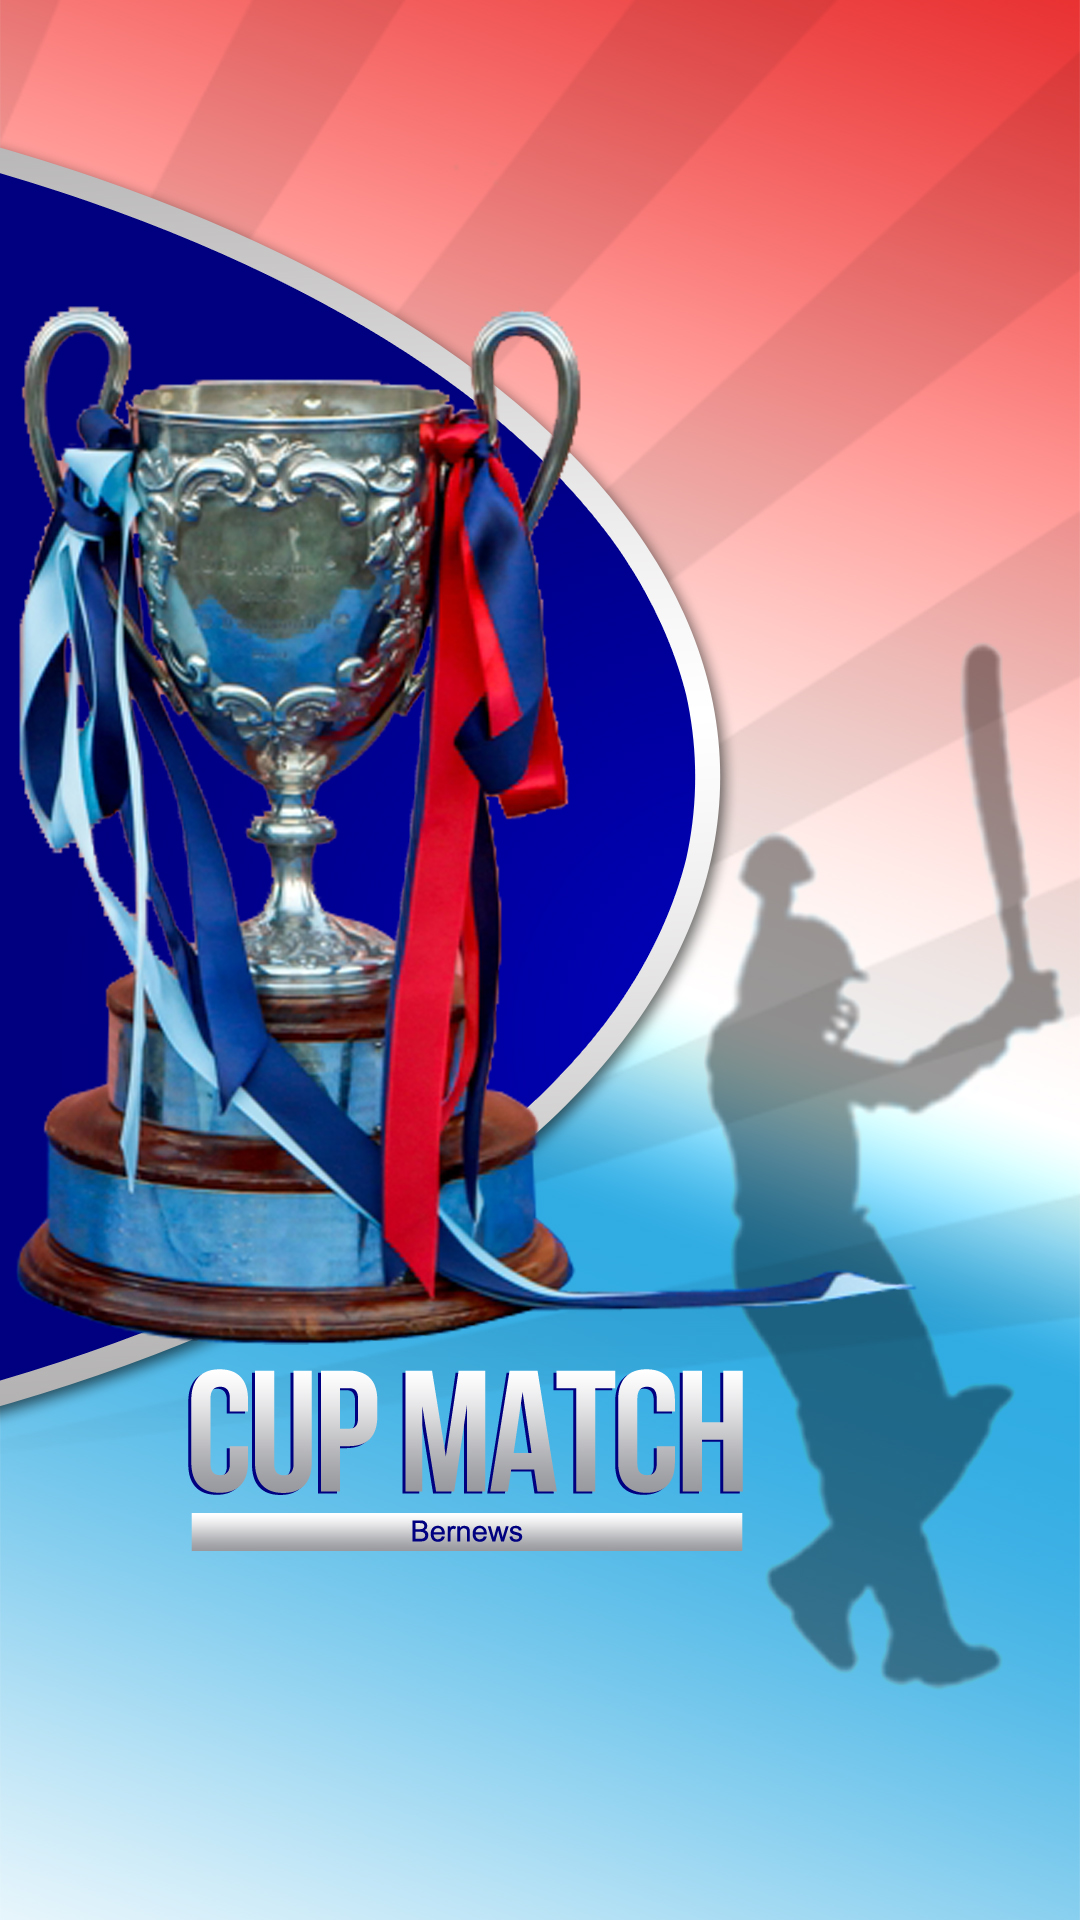 cupmatch wallpaper 4qerq3re